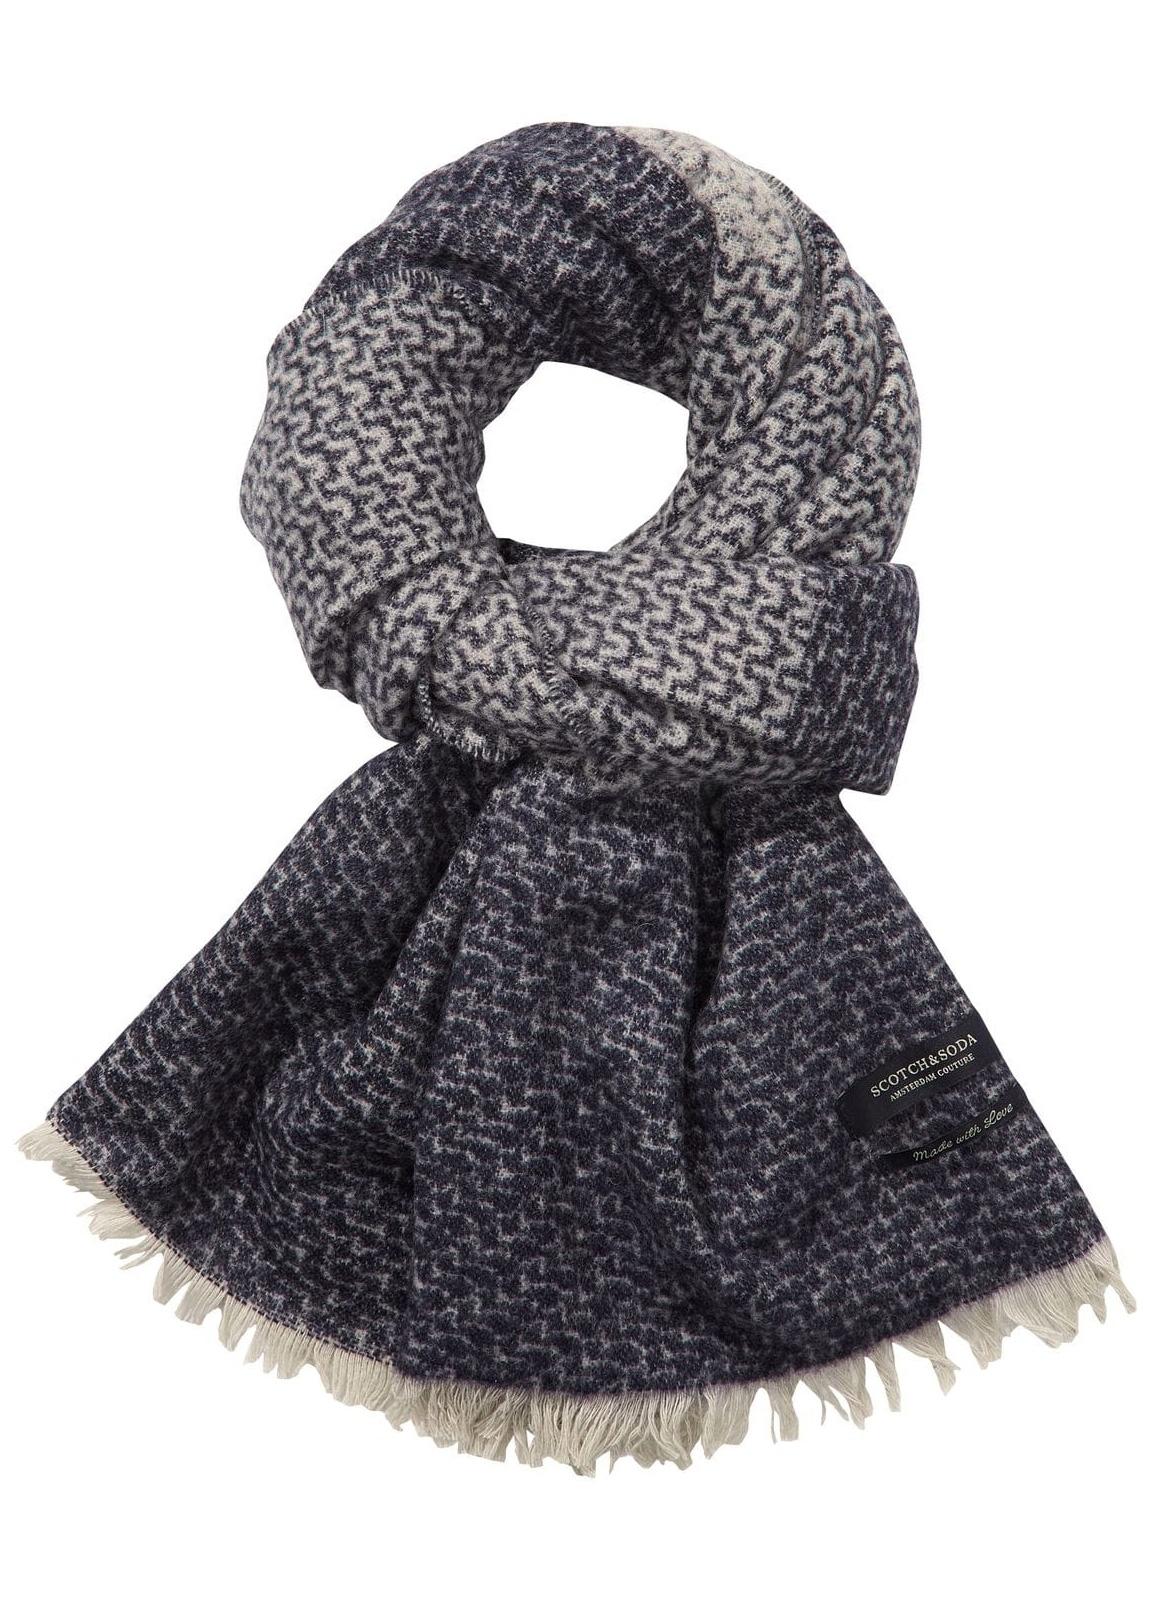 Bufanda combinada color azul 180 x 50 cm. 60% Lana 30% Algodón 10% Nylon.